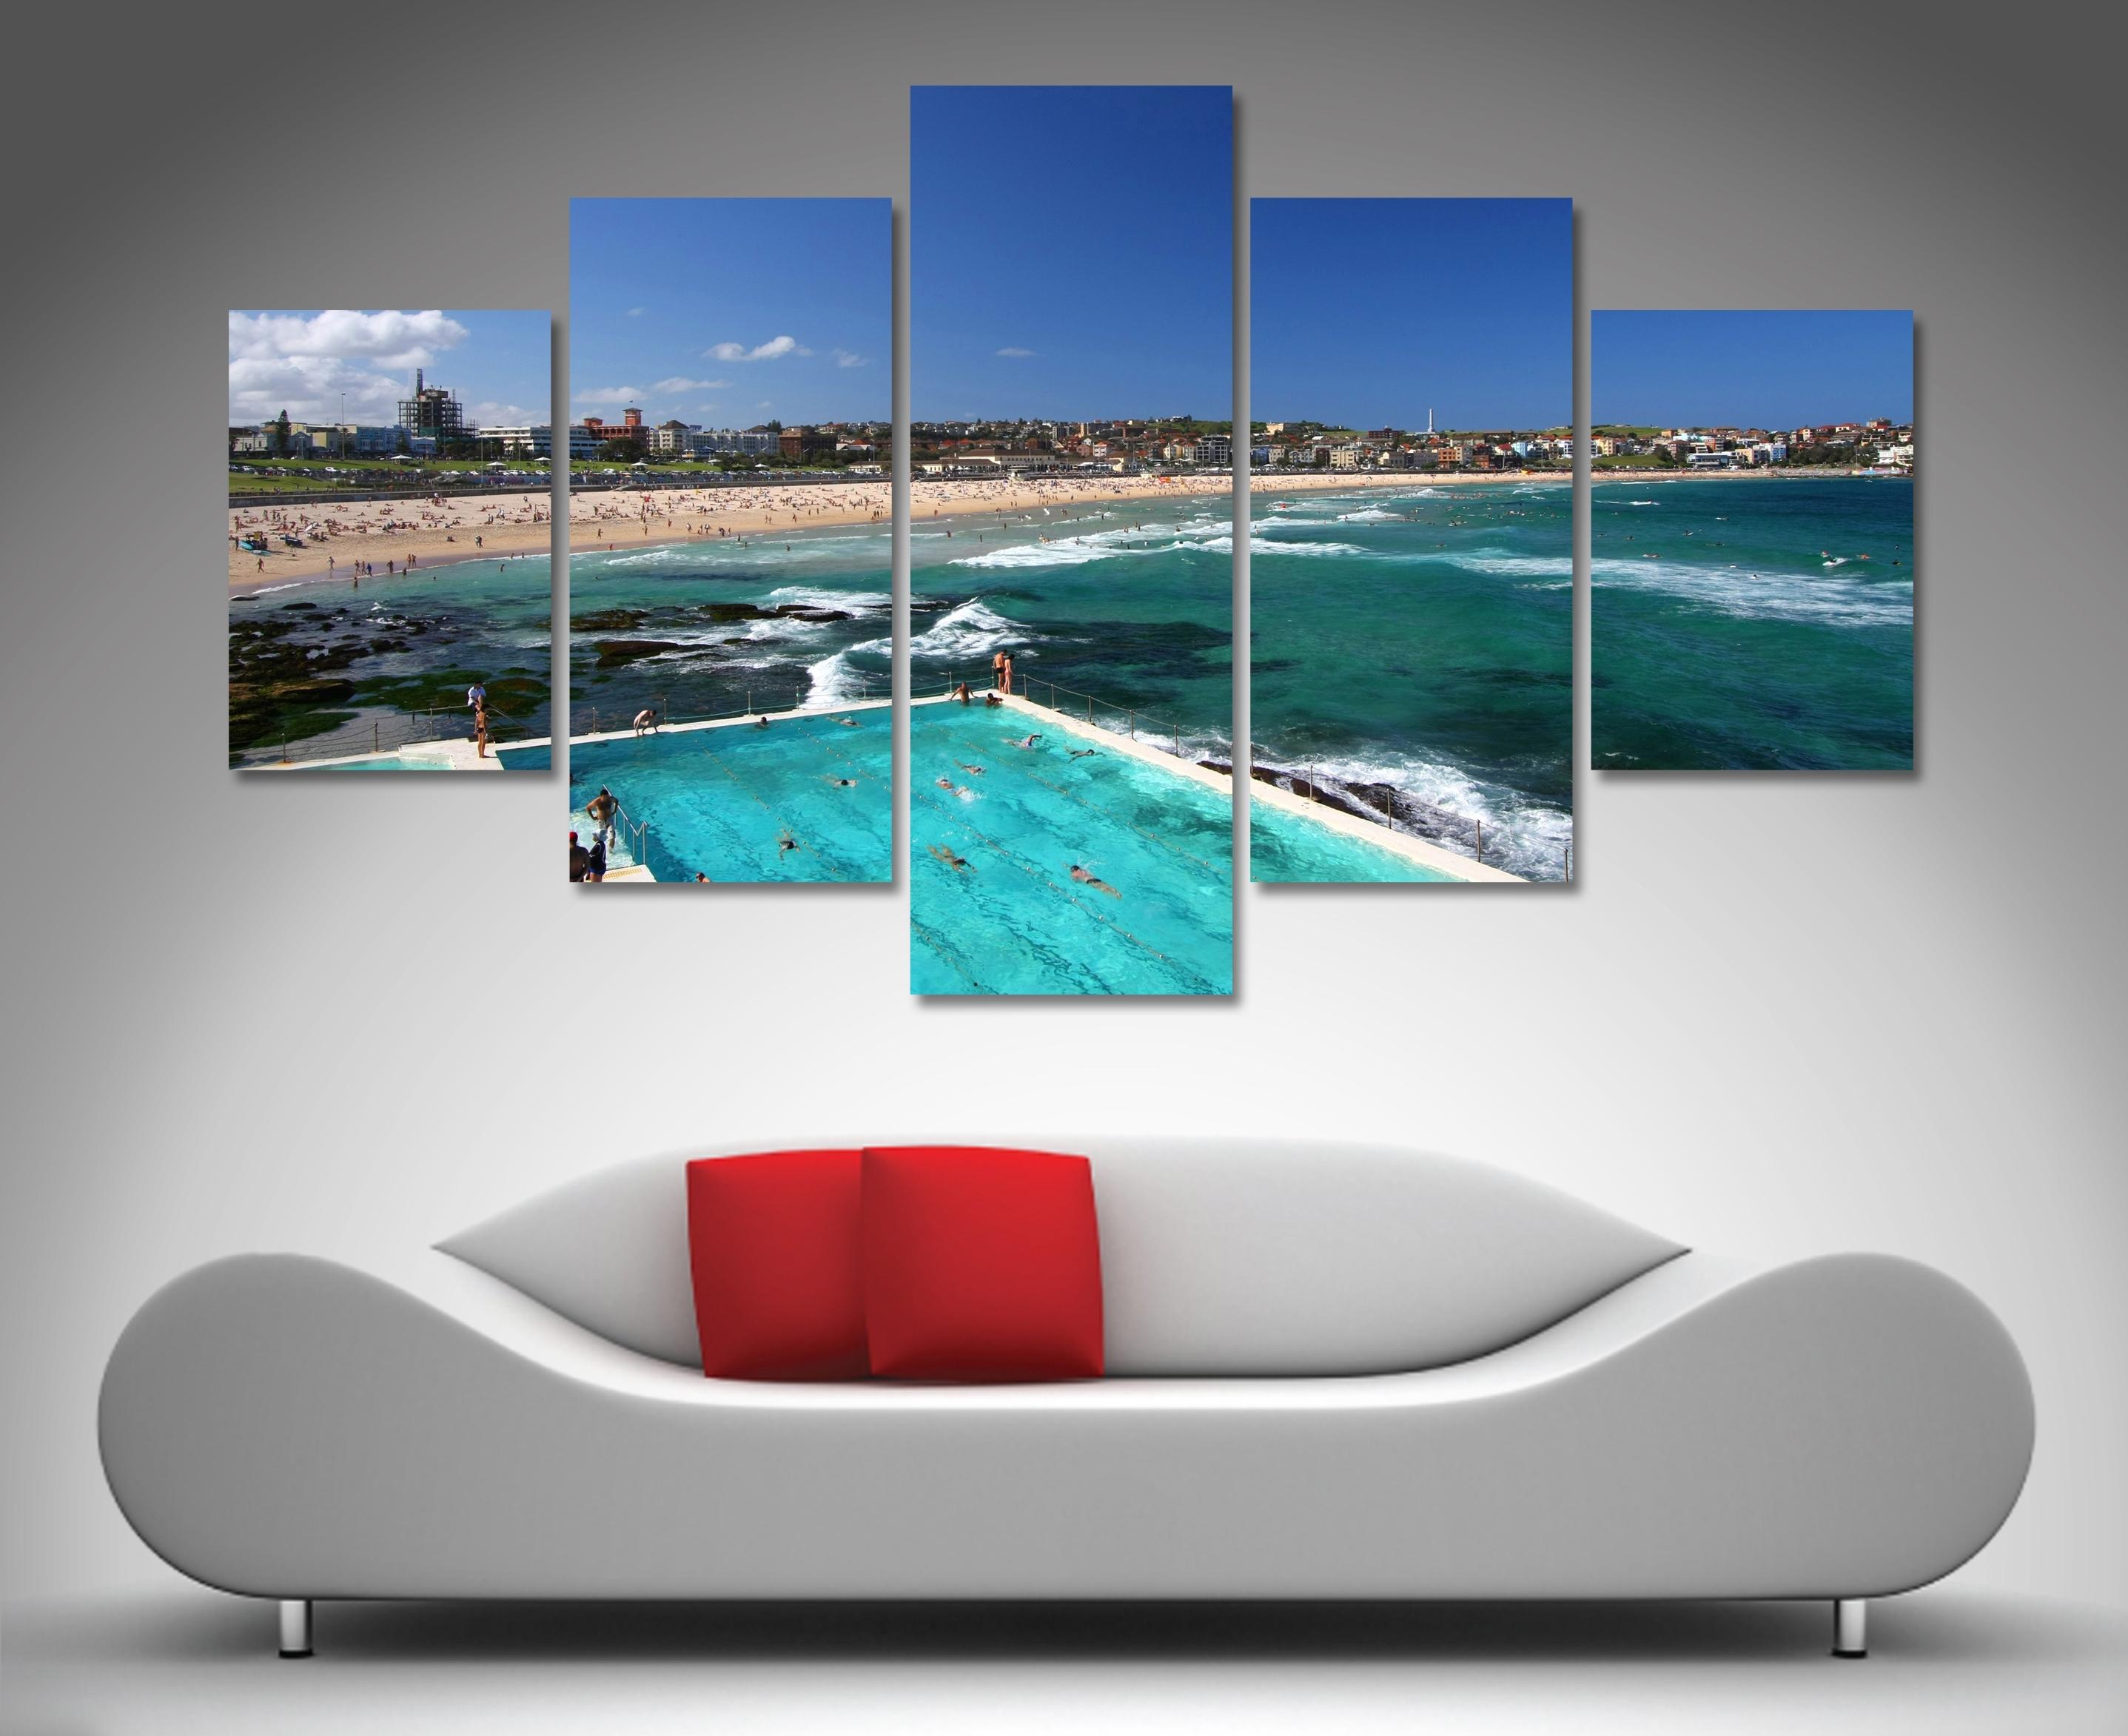 Bondi Beach 5 Panel Wall Art | Canvas Printing Australia for 5 Panel Wall Art (Image 10 of 20)